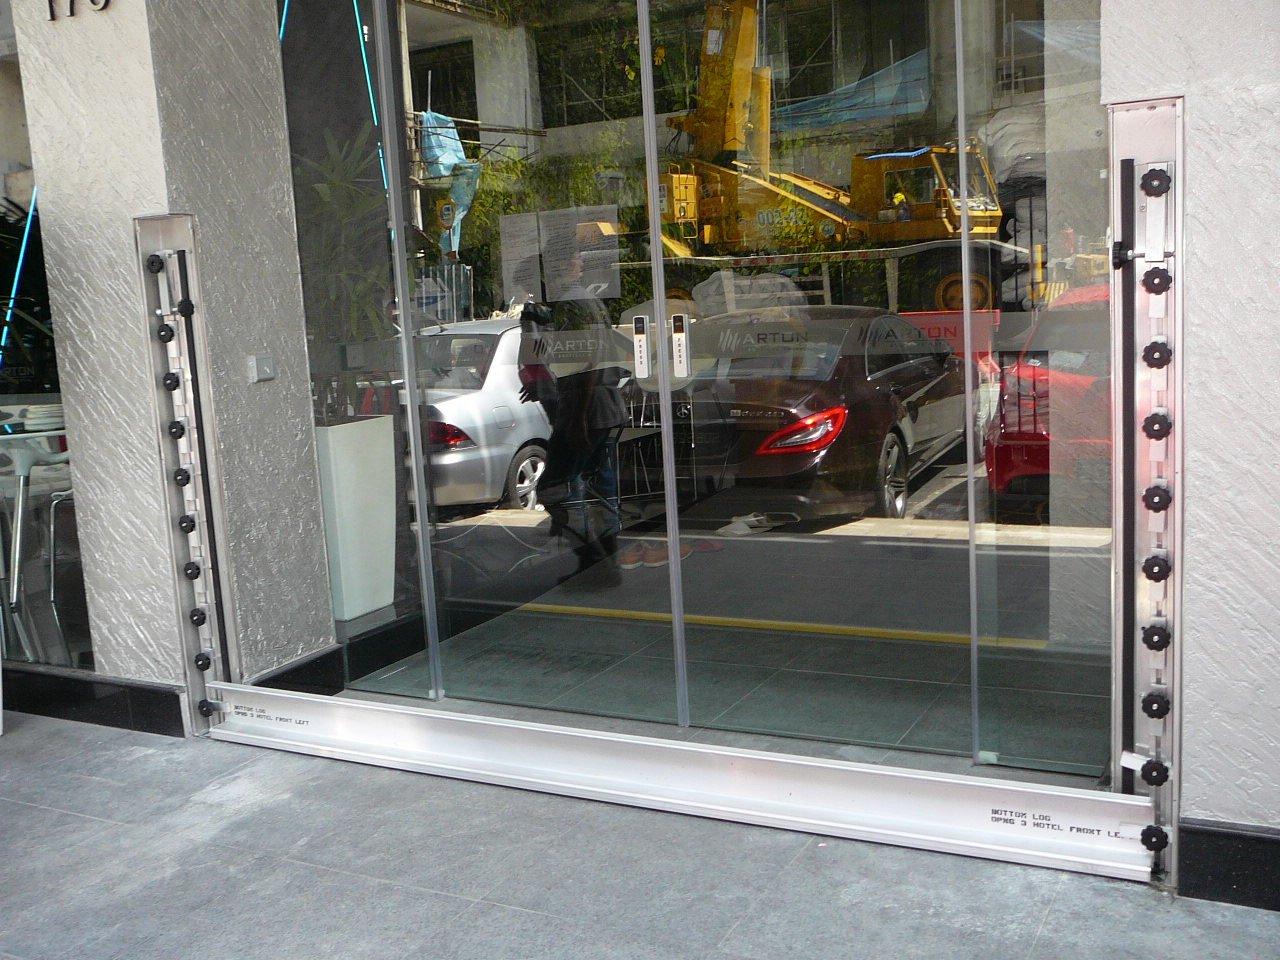 FastLogs installed in new hotel on Tyrwhitt Rd in Singapore. Photo: Deployment of FastLogs.